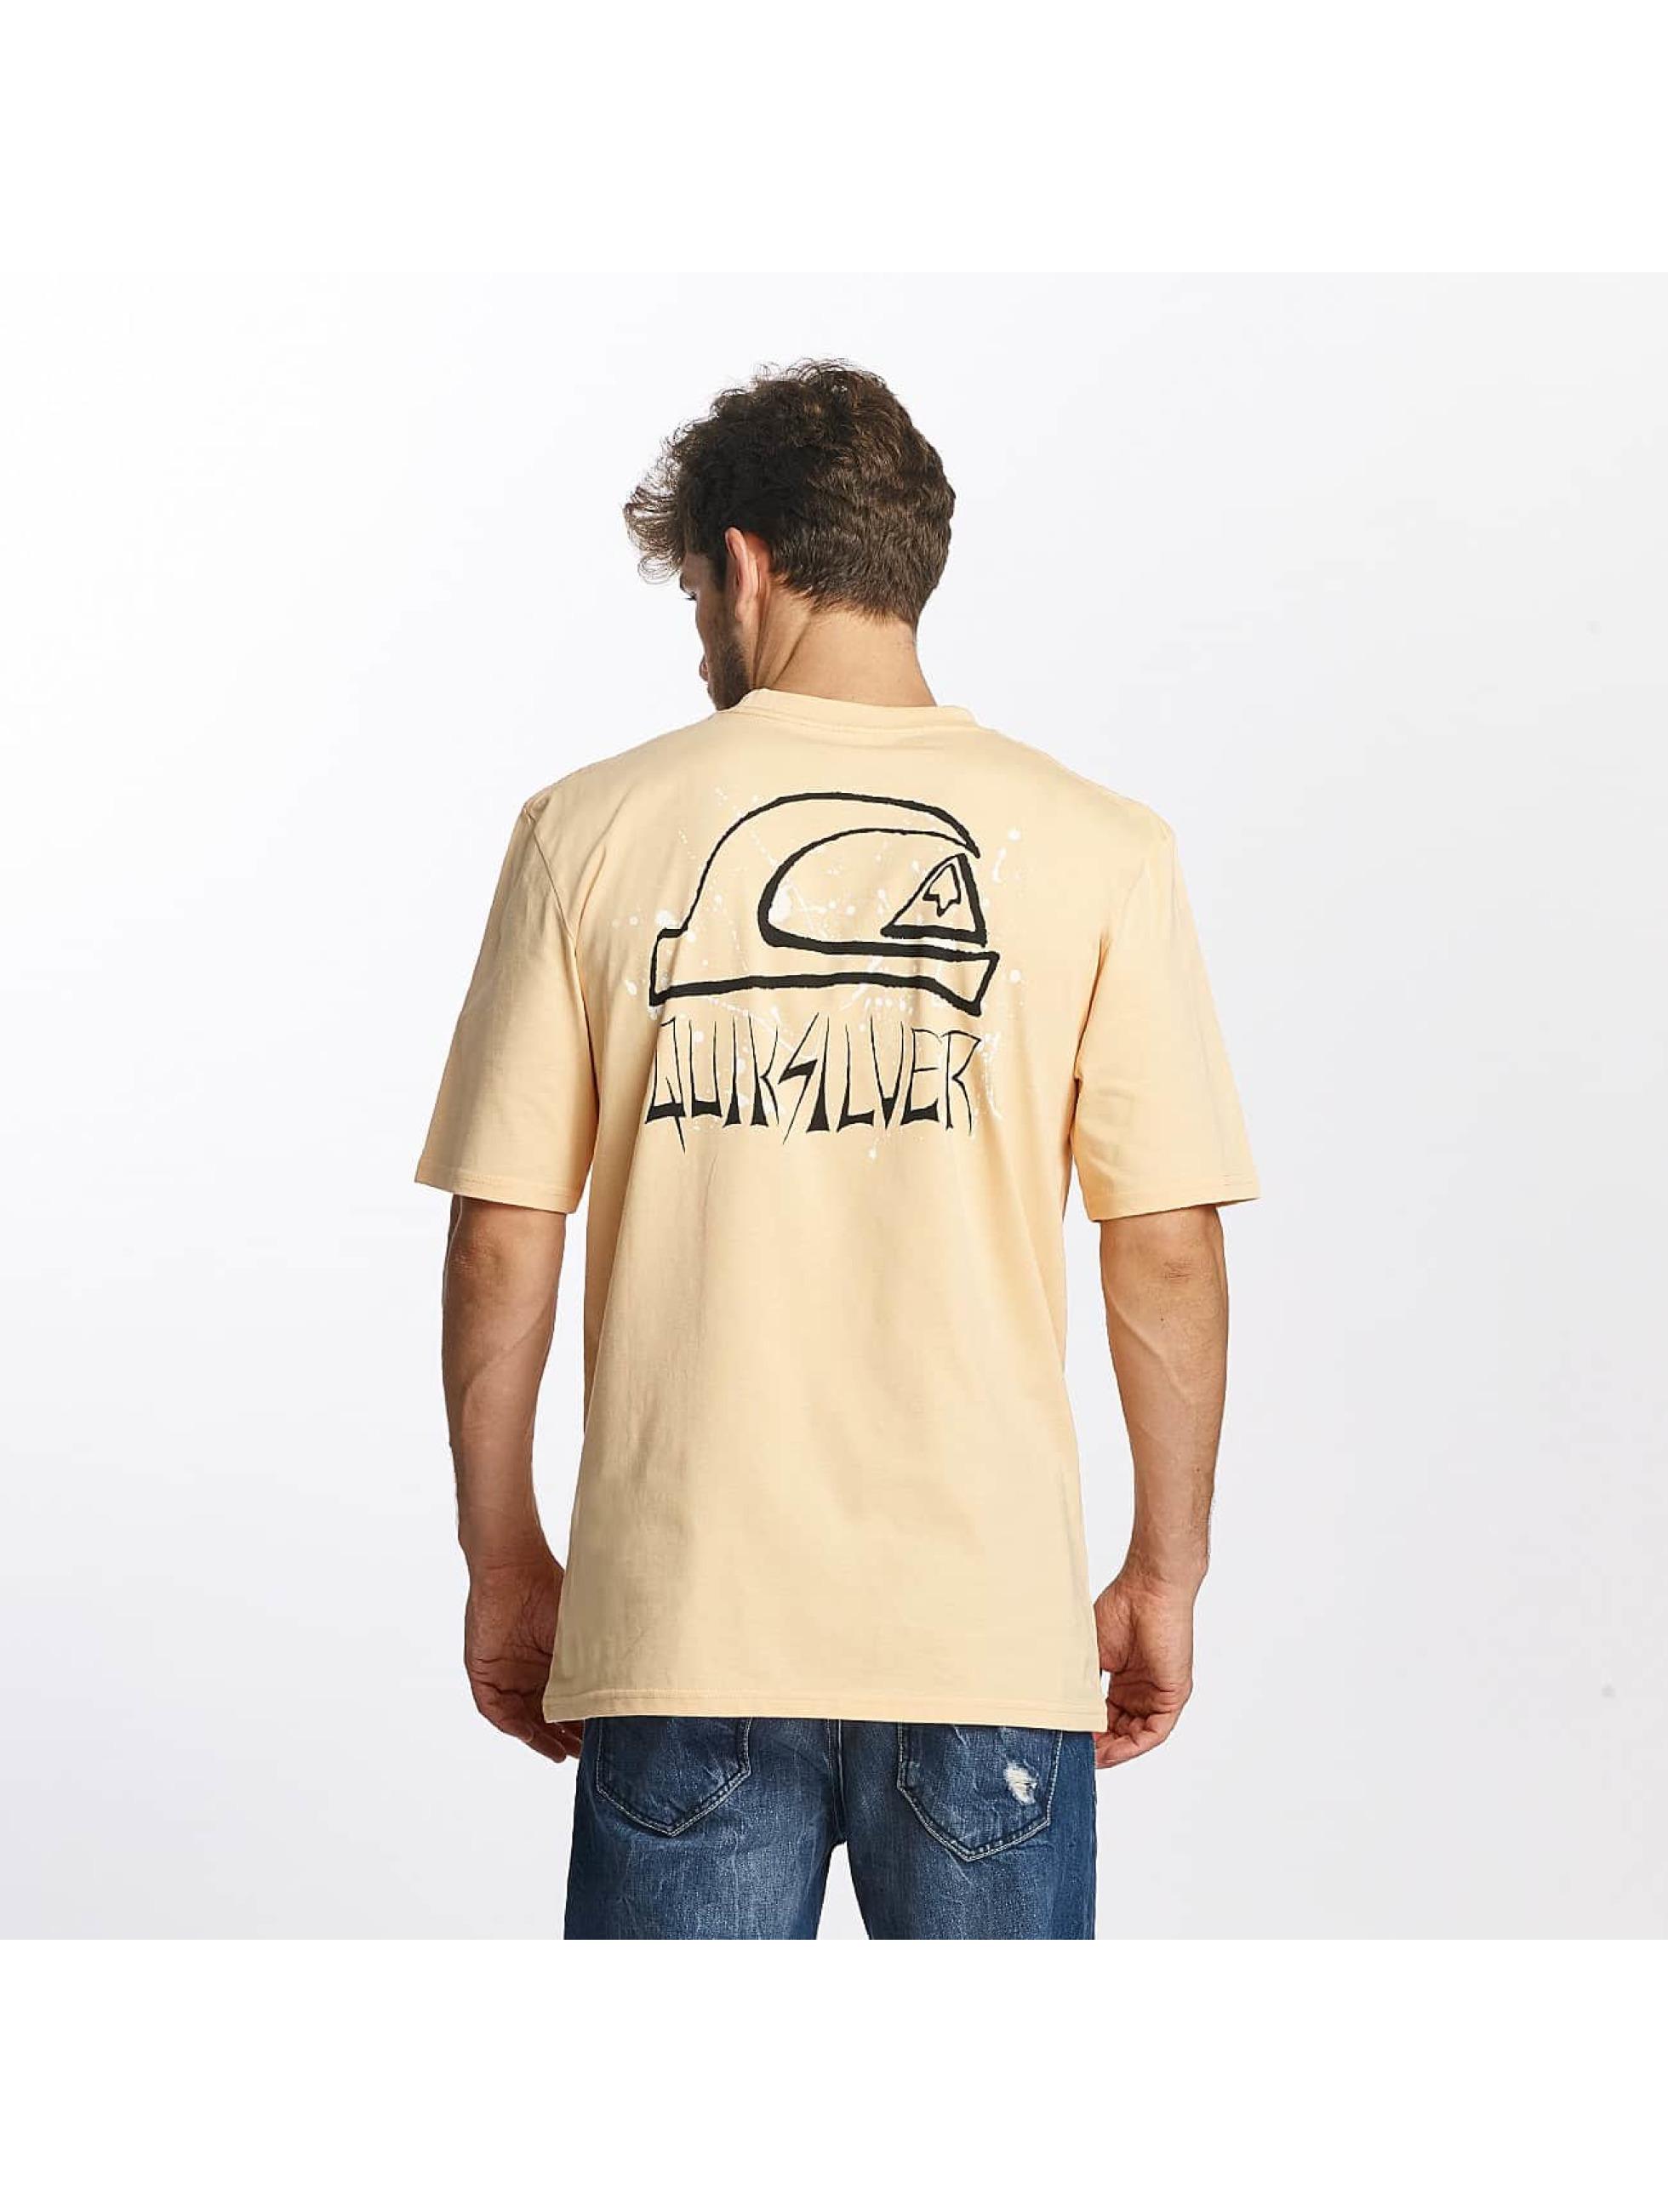 Quiksilver T-shirt Neon Tendencies arancio